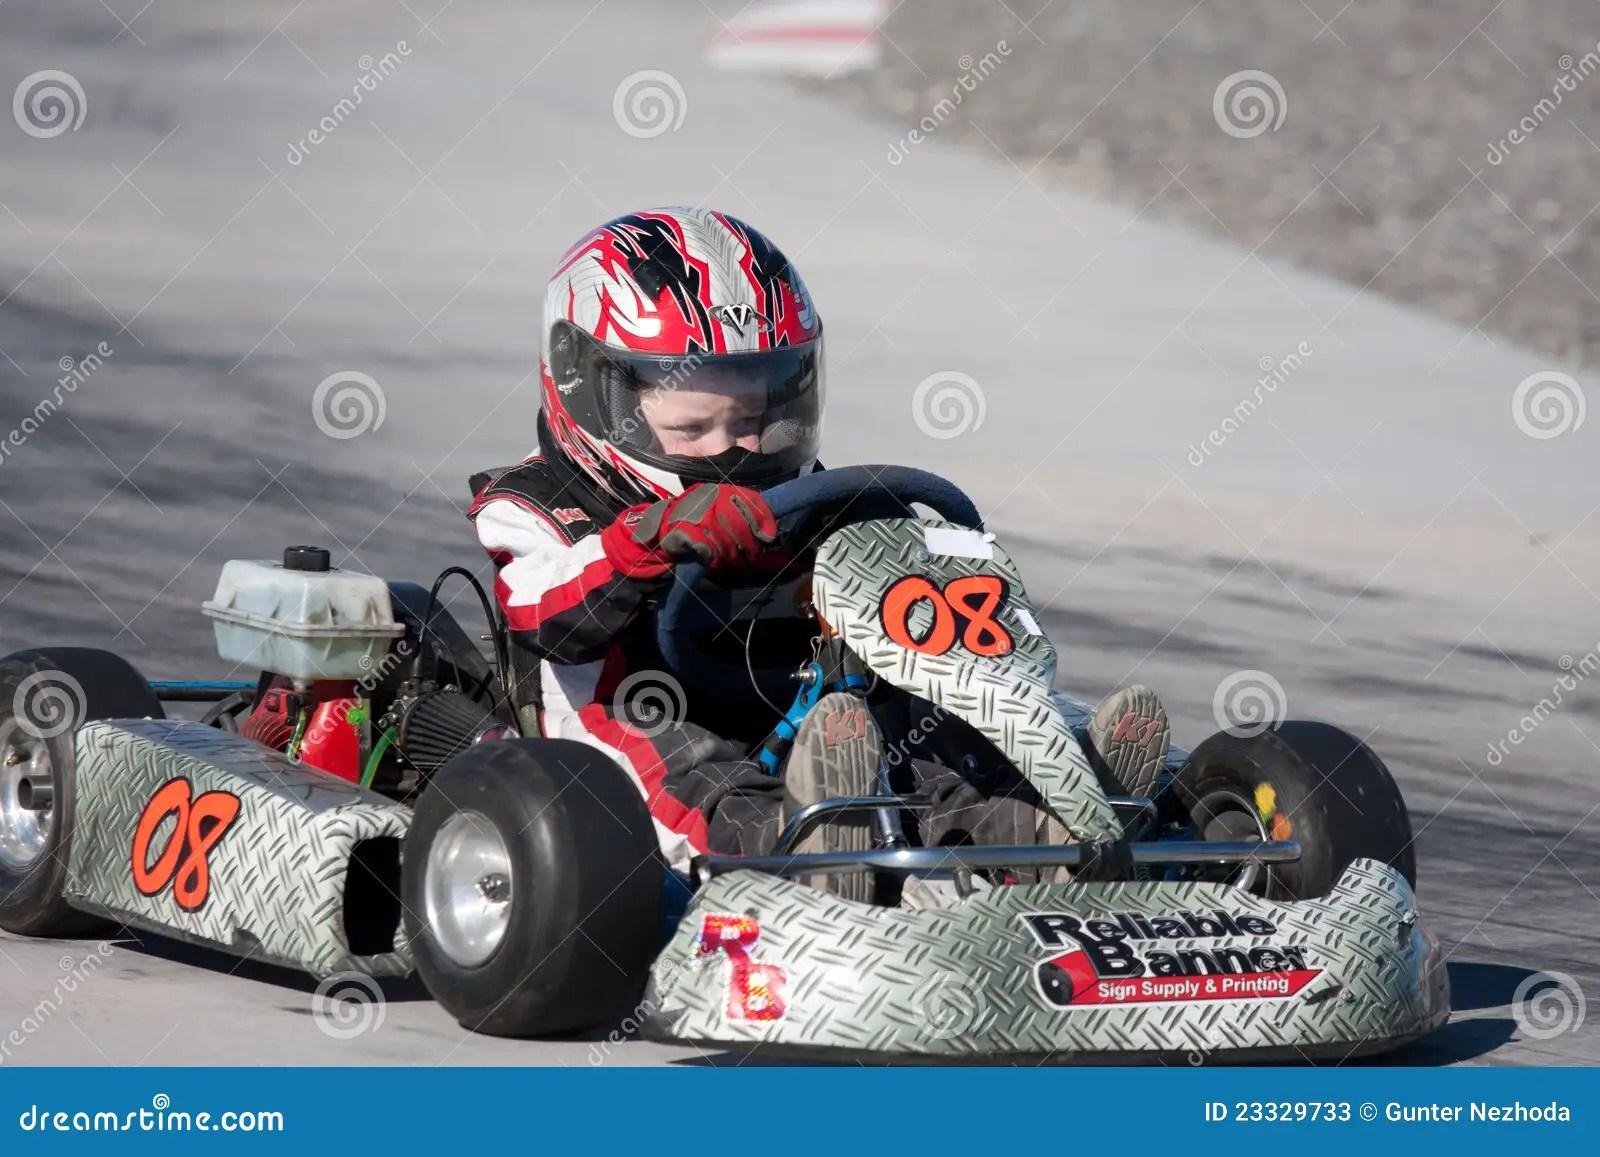 Audio Car Wallpaper Download Racing Go Kart Editorial Stock Photo Image 23329733